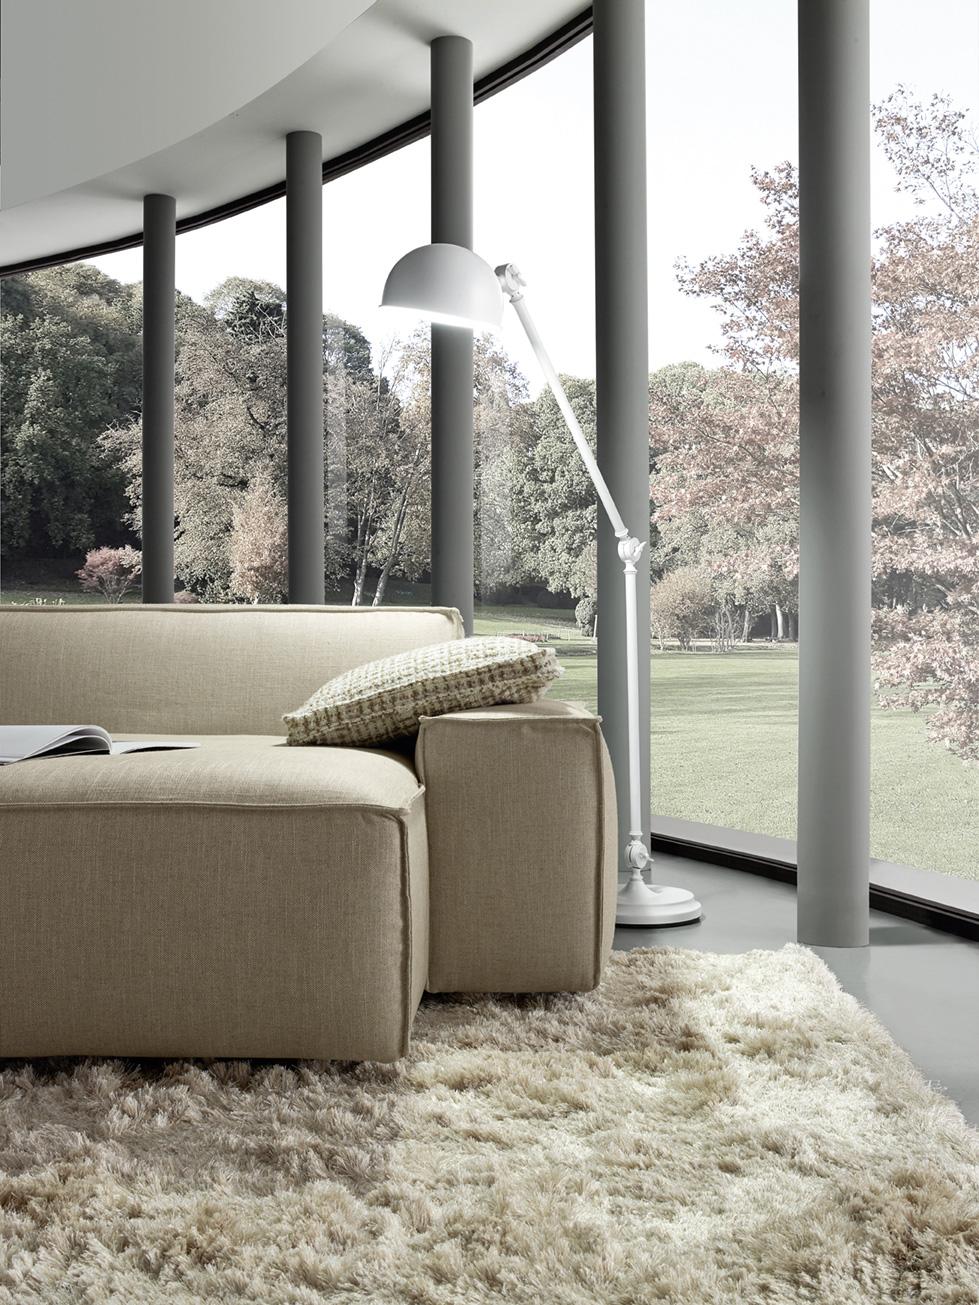 close up fabric beige low modern sofa, comfortable low sofa with no legs, xamilos monternos anetos kanapes kontino, white stand lamp, beige 3-seater sofa,